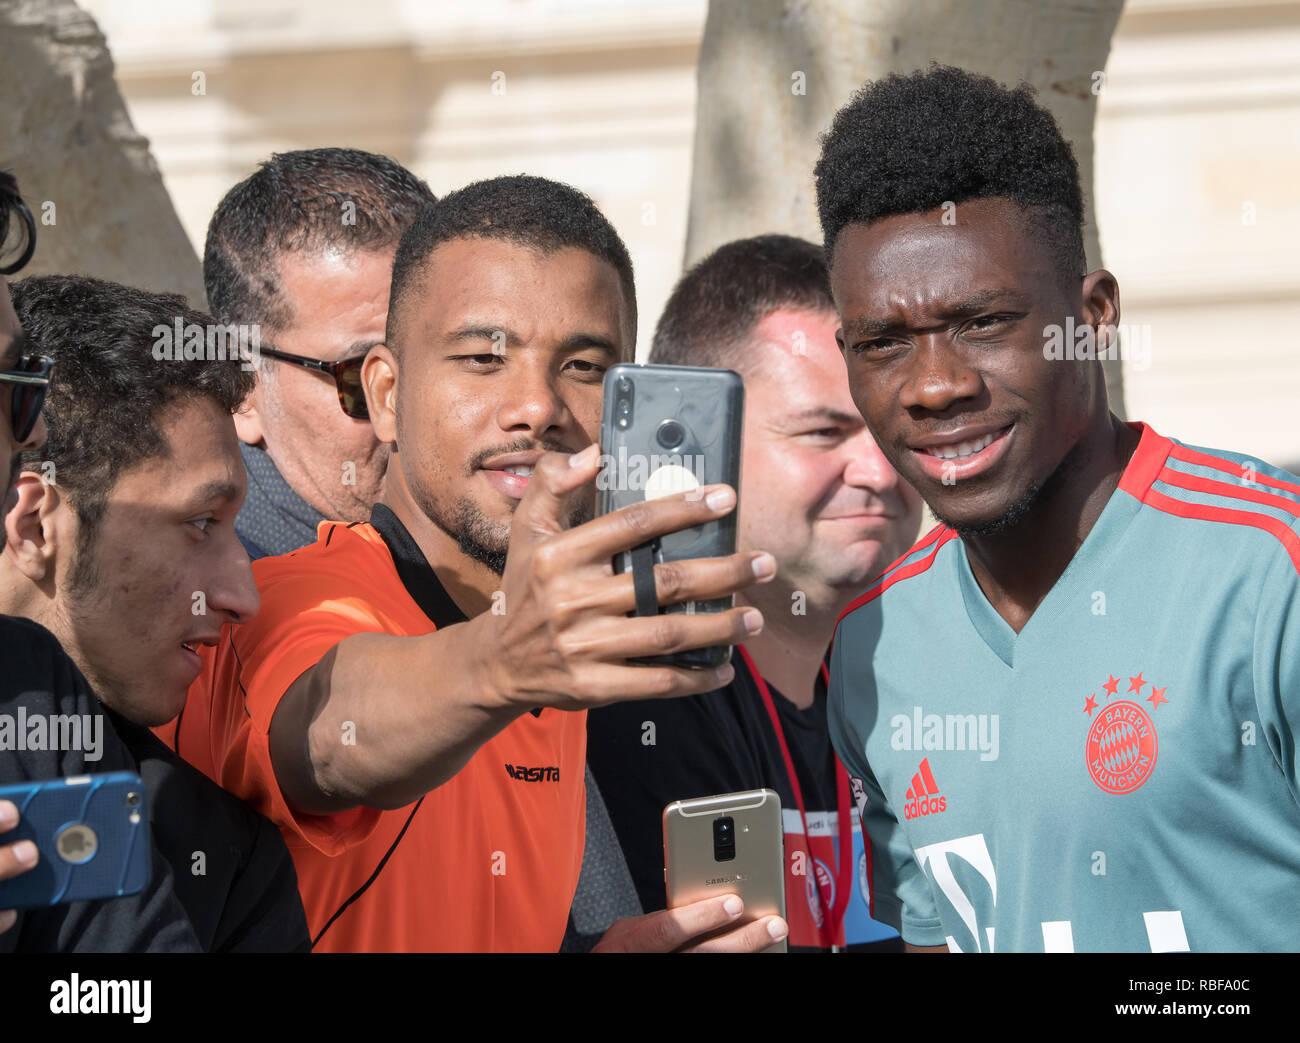 811b8e0ae Training Start Fc Bayern Munich Stock Photos   Training Start Fc ...